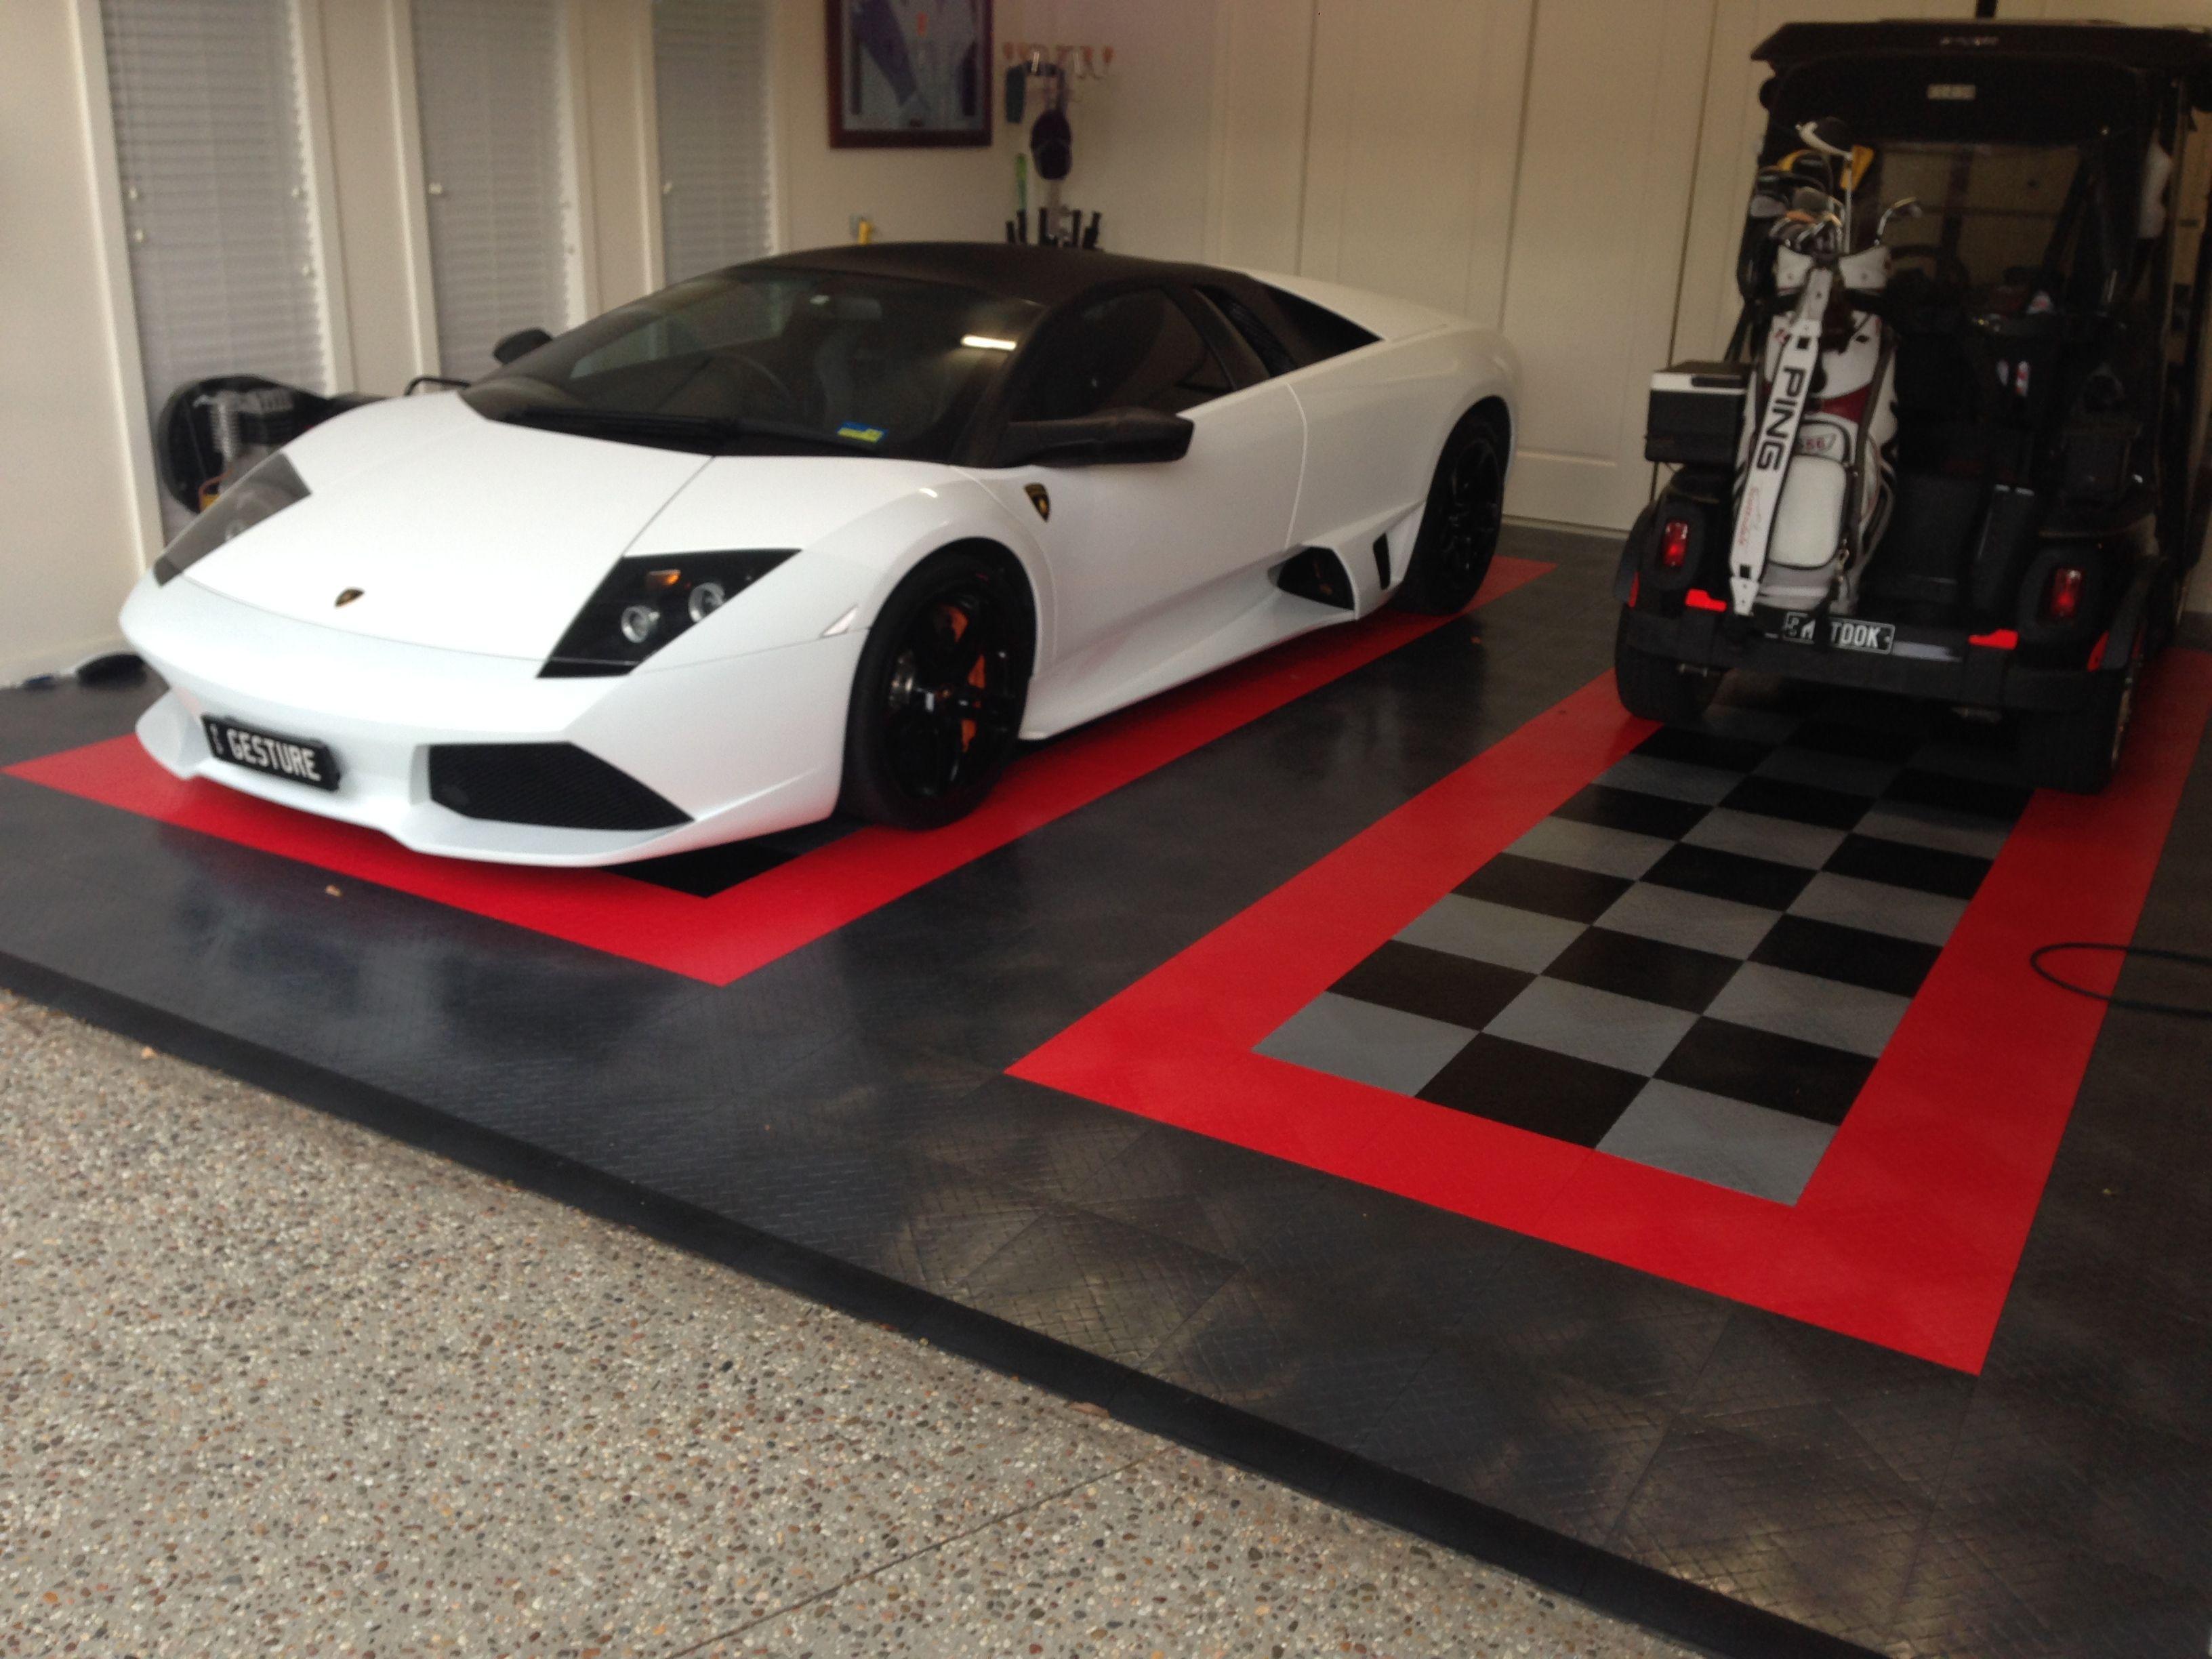 Storage Ideas RaceDeck Garage Flooring With A Nice Lamborghini Resting On It